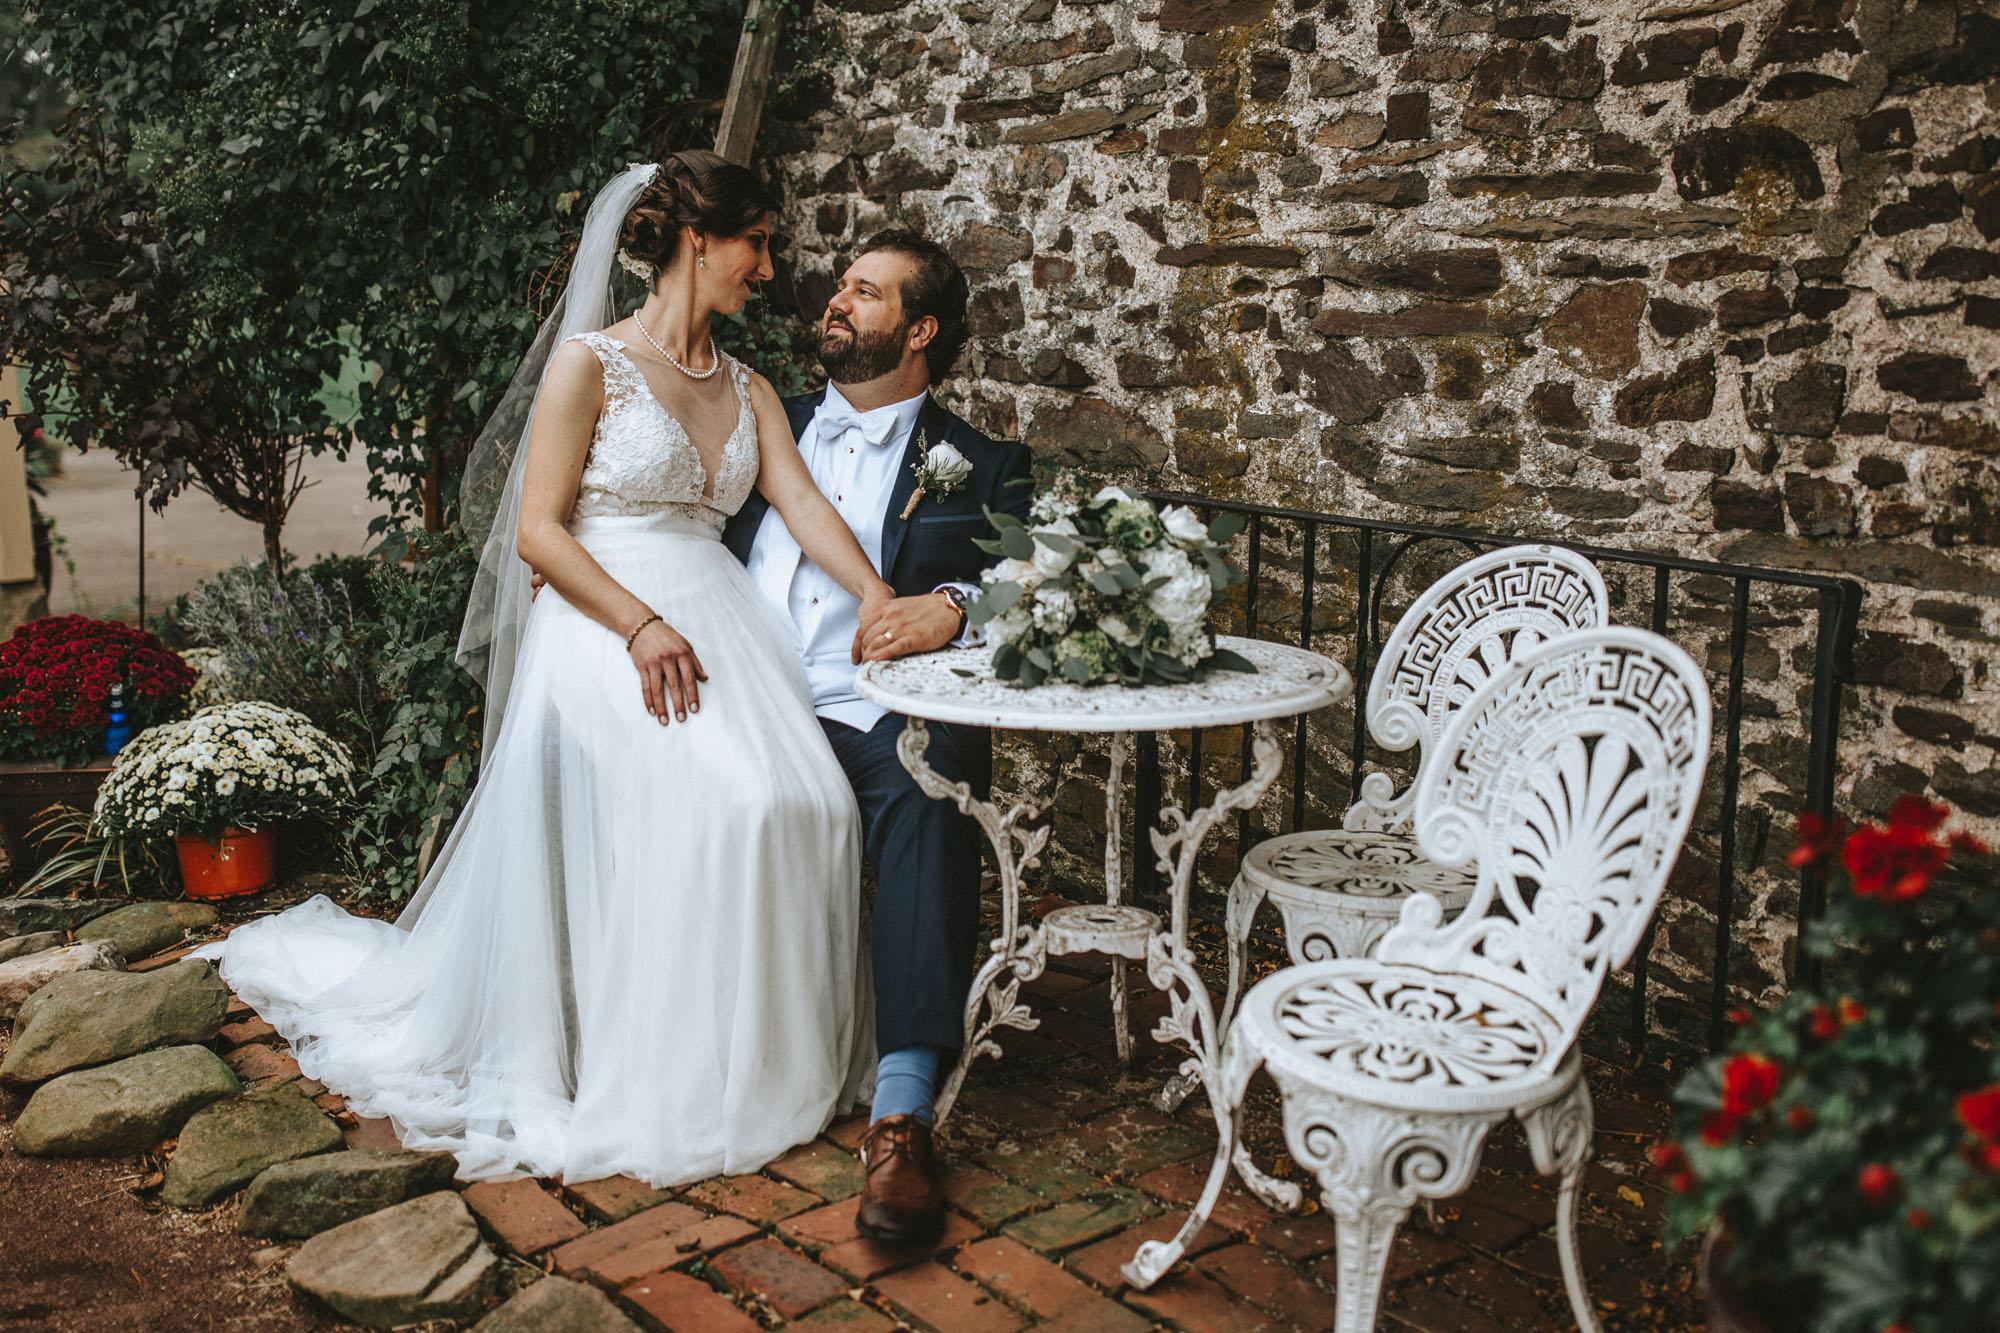 Twisted-Oaks-Studio-Arianne-Sean-Wedding-260.jpg